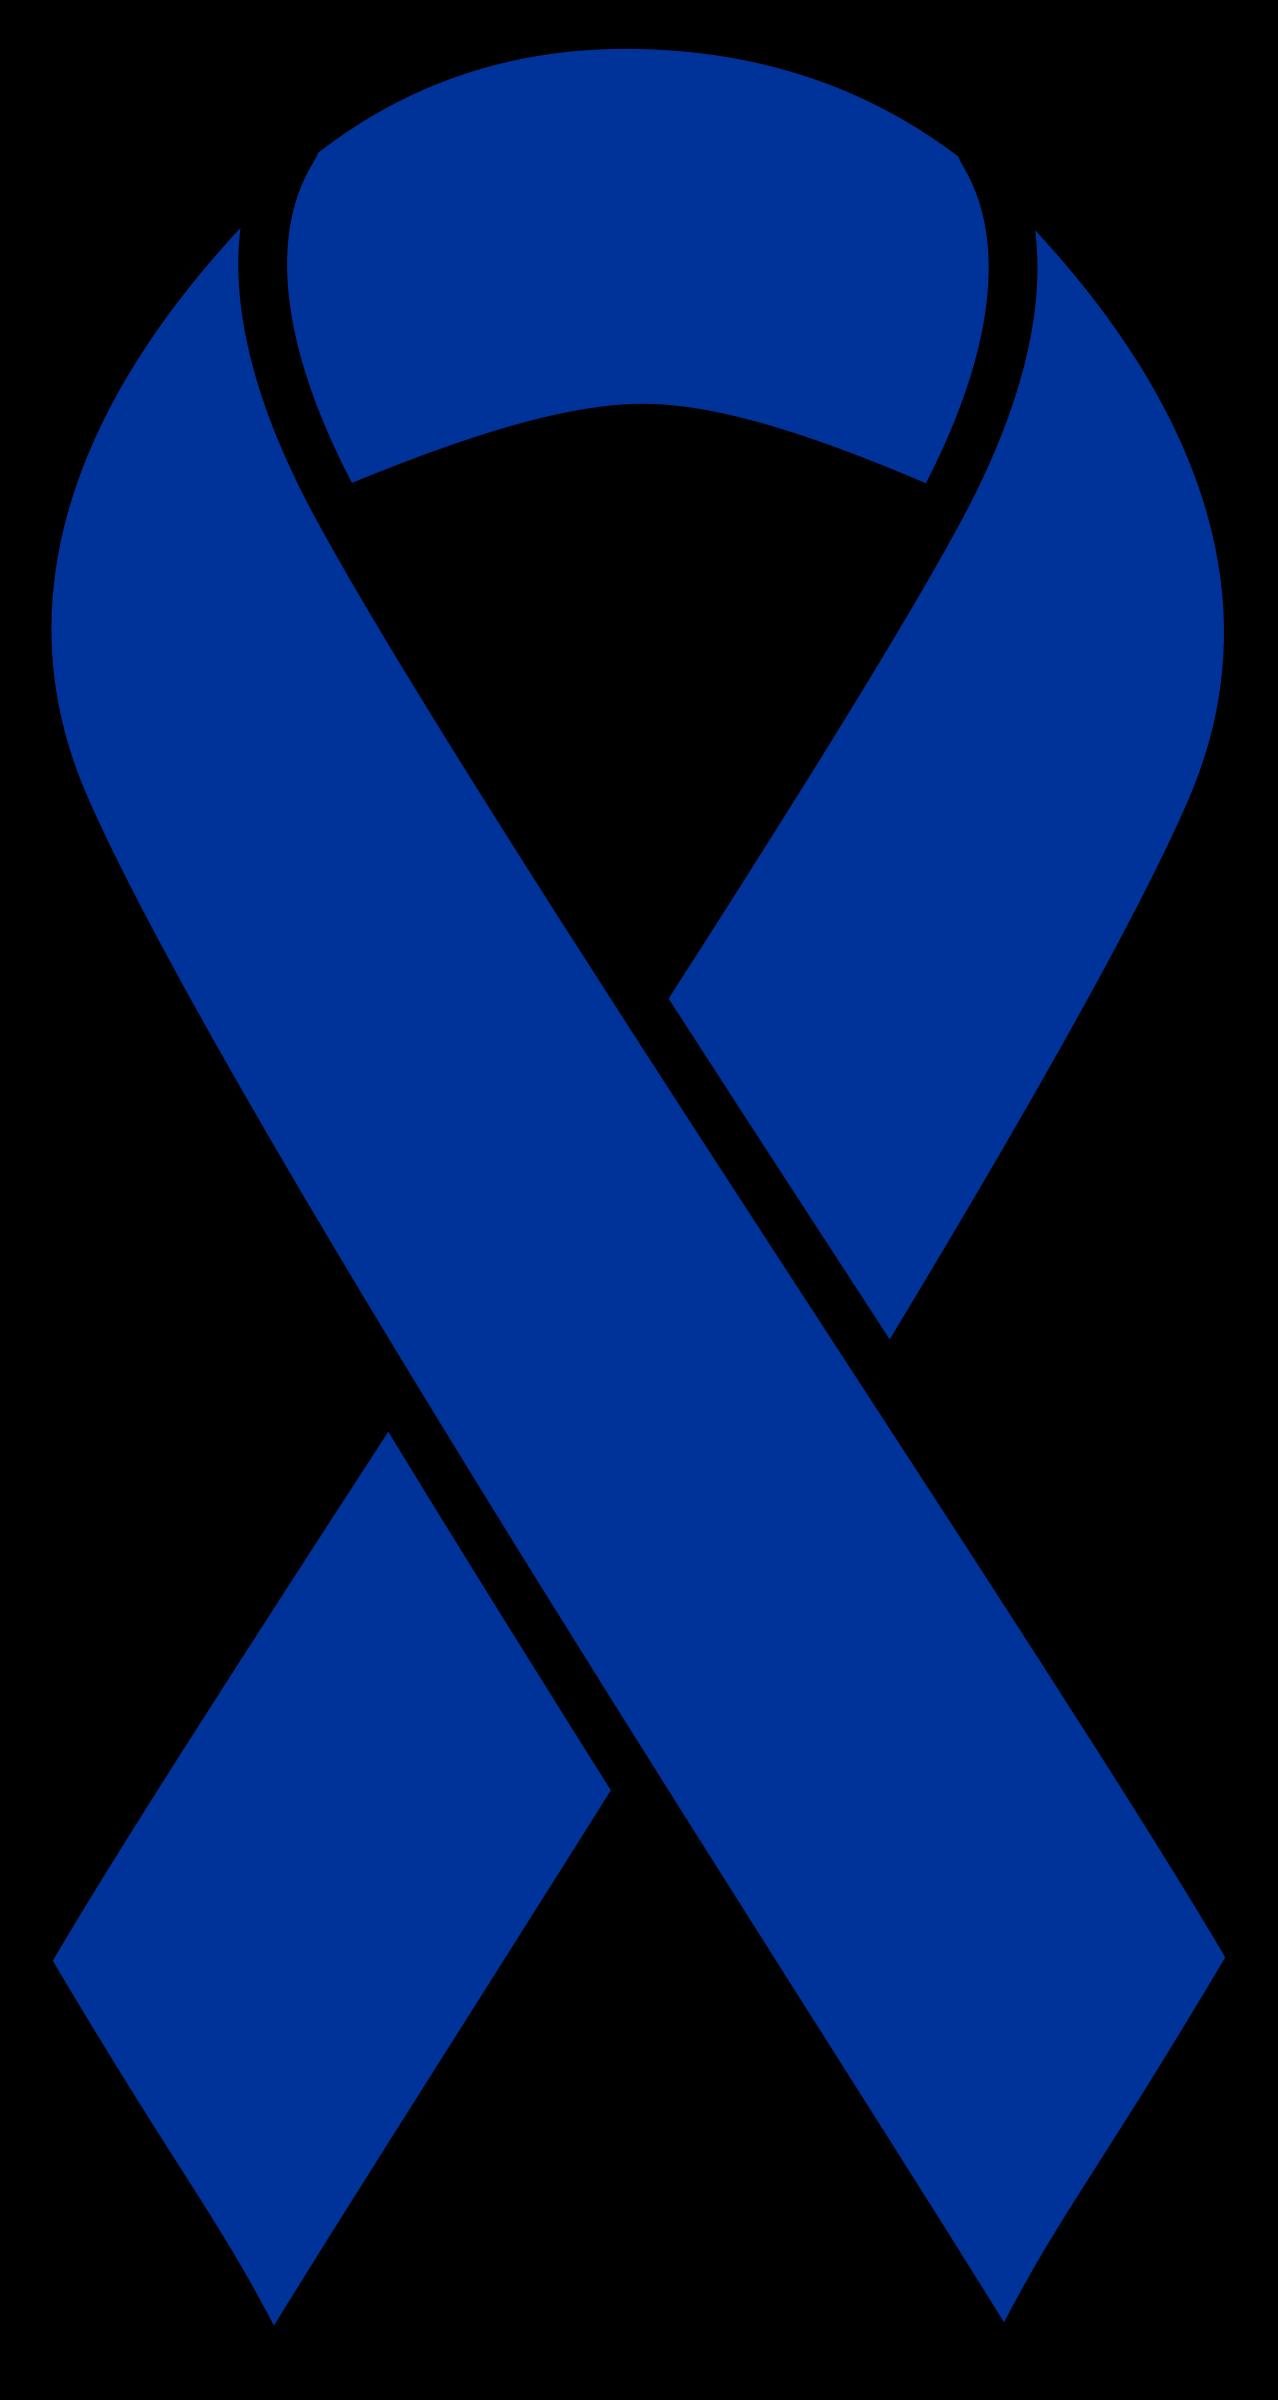 clip art black and white stock Cancer clipart. Blue colon ribbon big